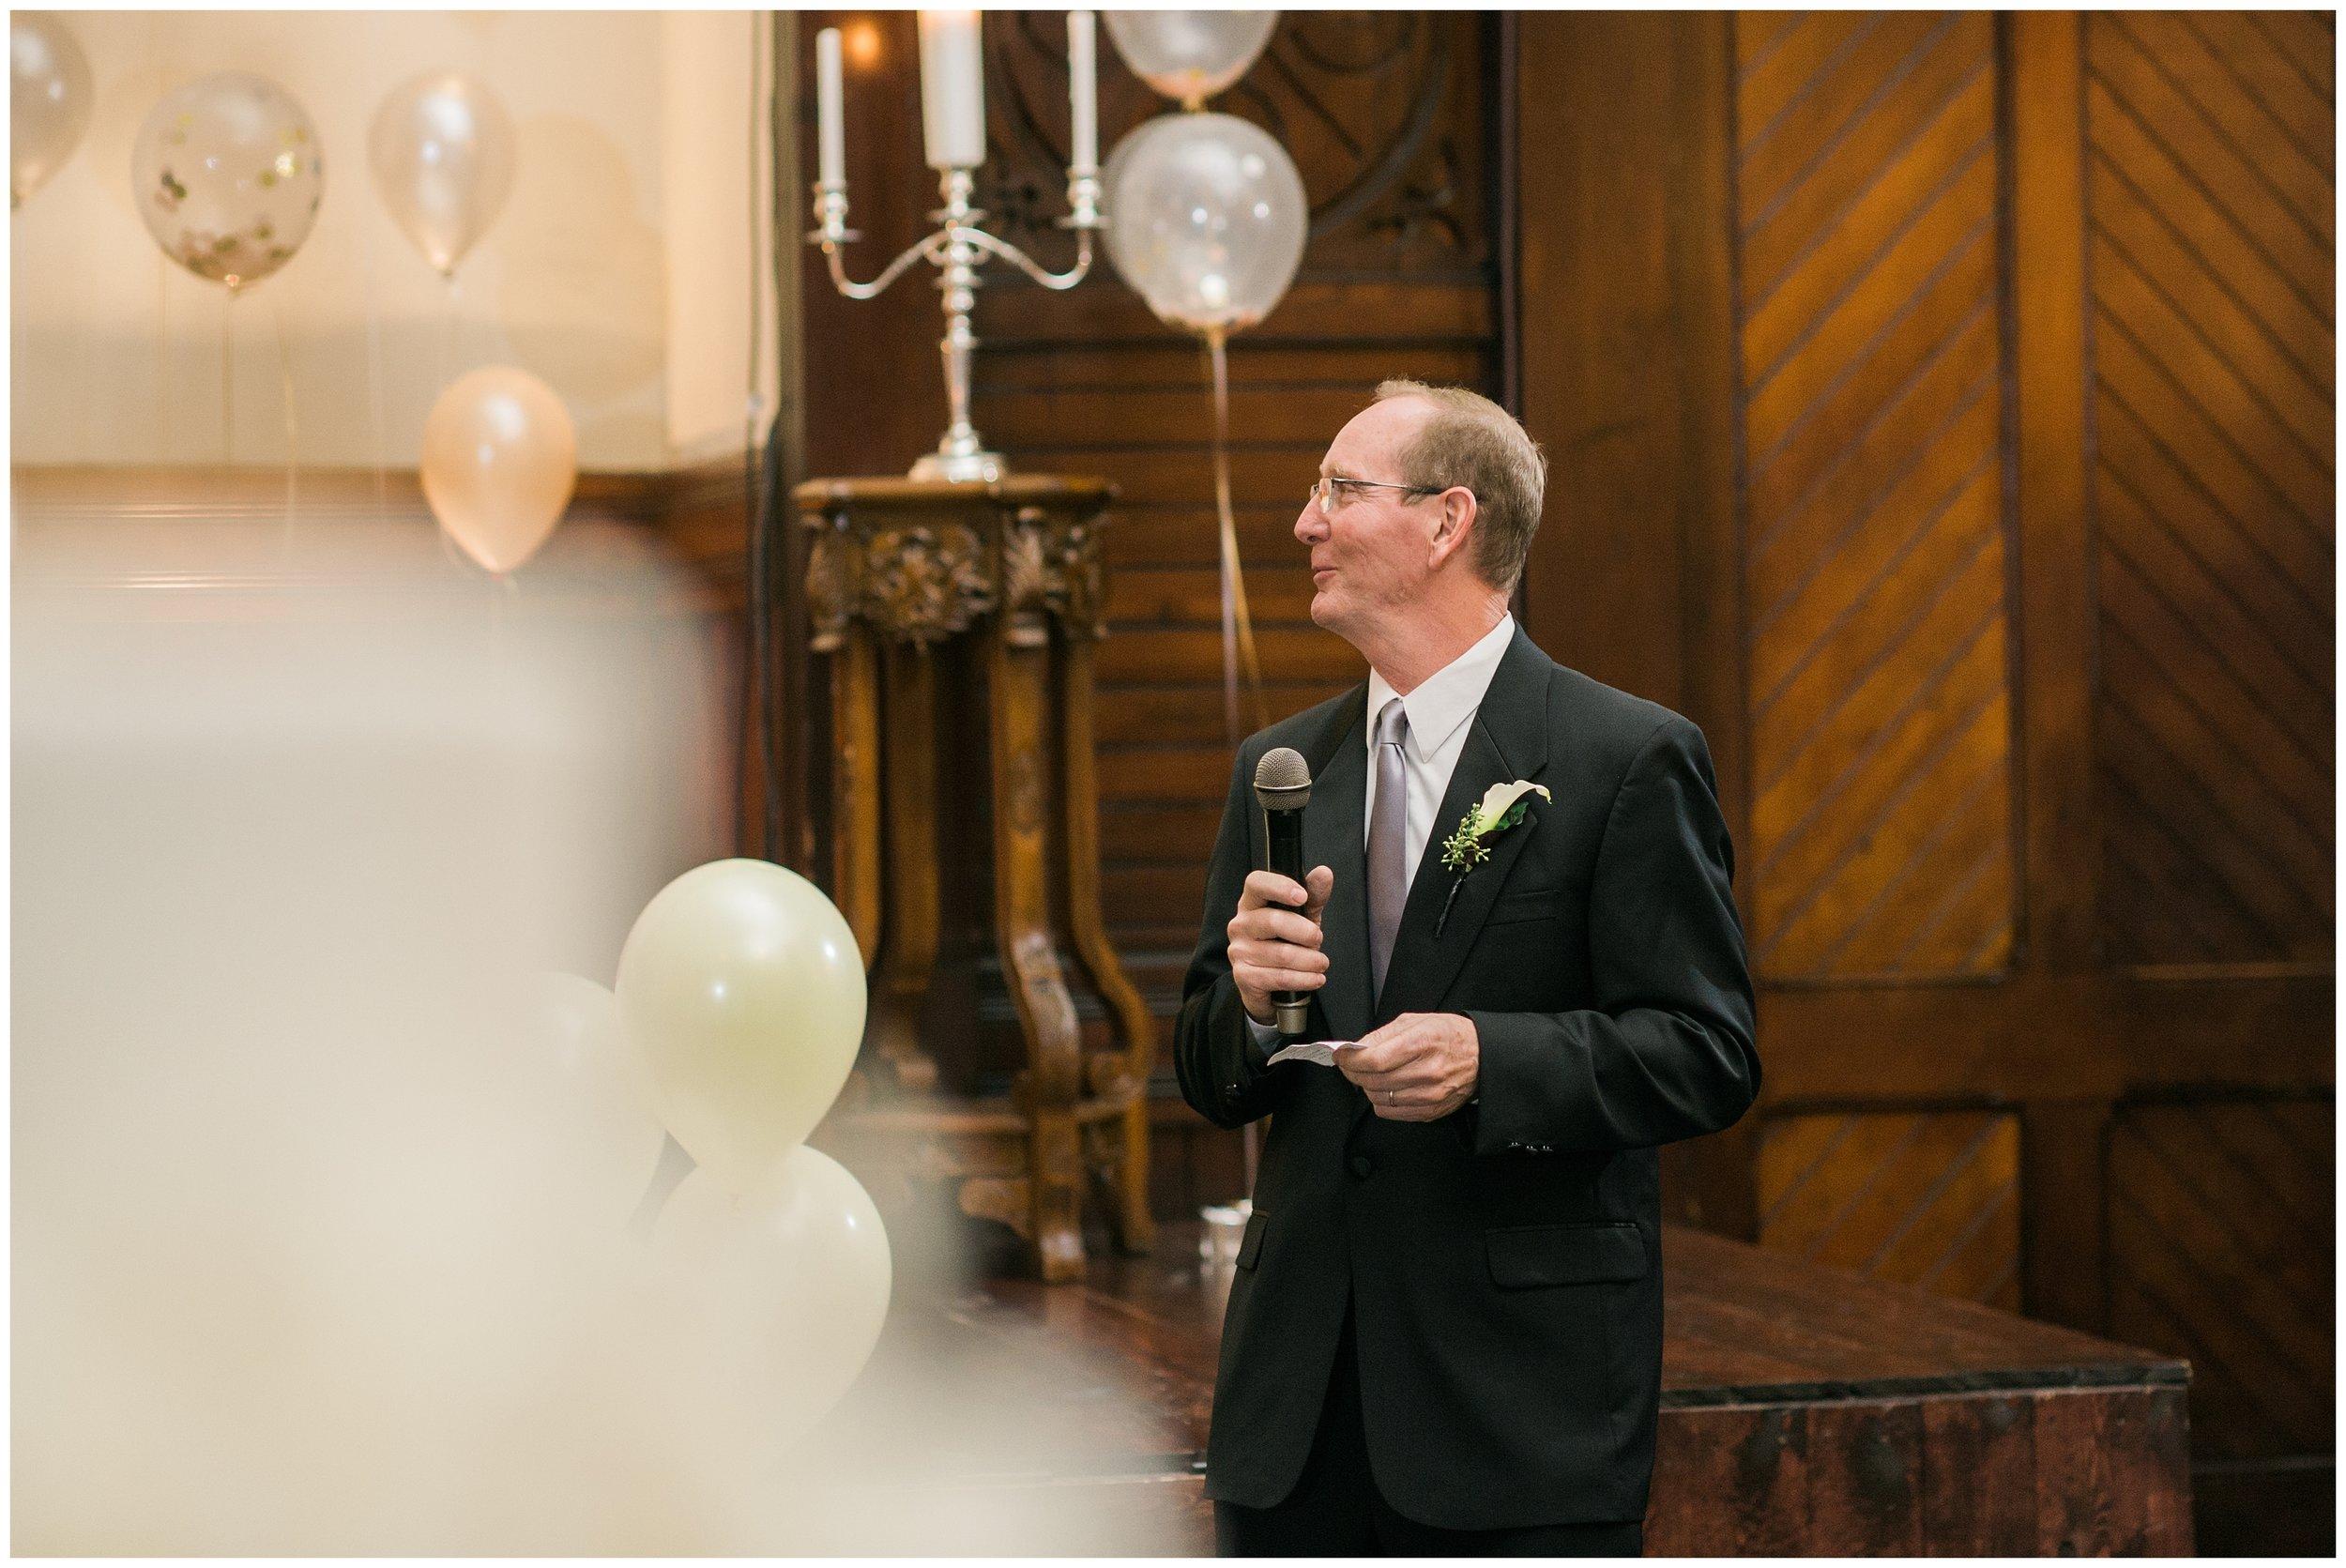 Rebecca_Bridges_Photography_Indianapolis_Wedding_Photographer_5842.jpg